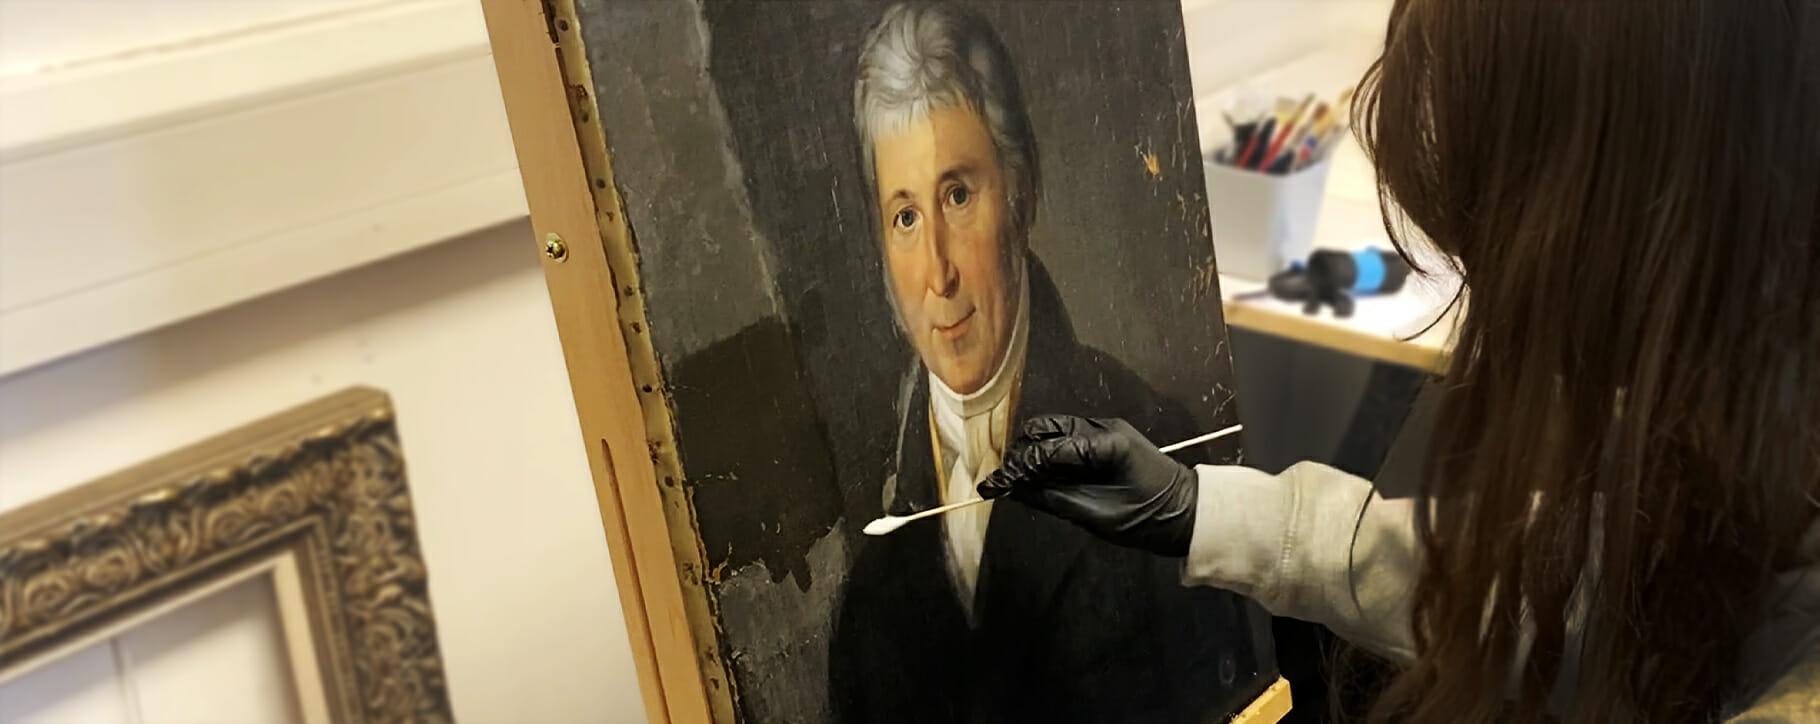 Portrait Cleaning Conservator Screencap